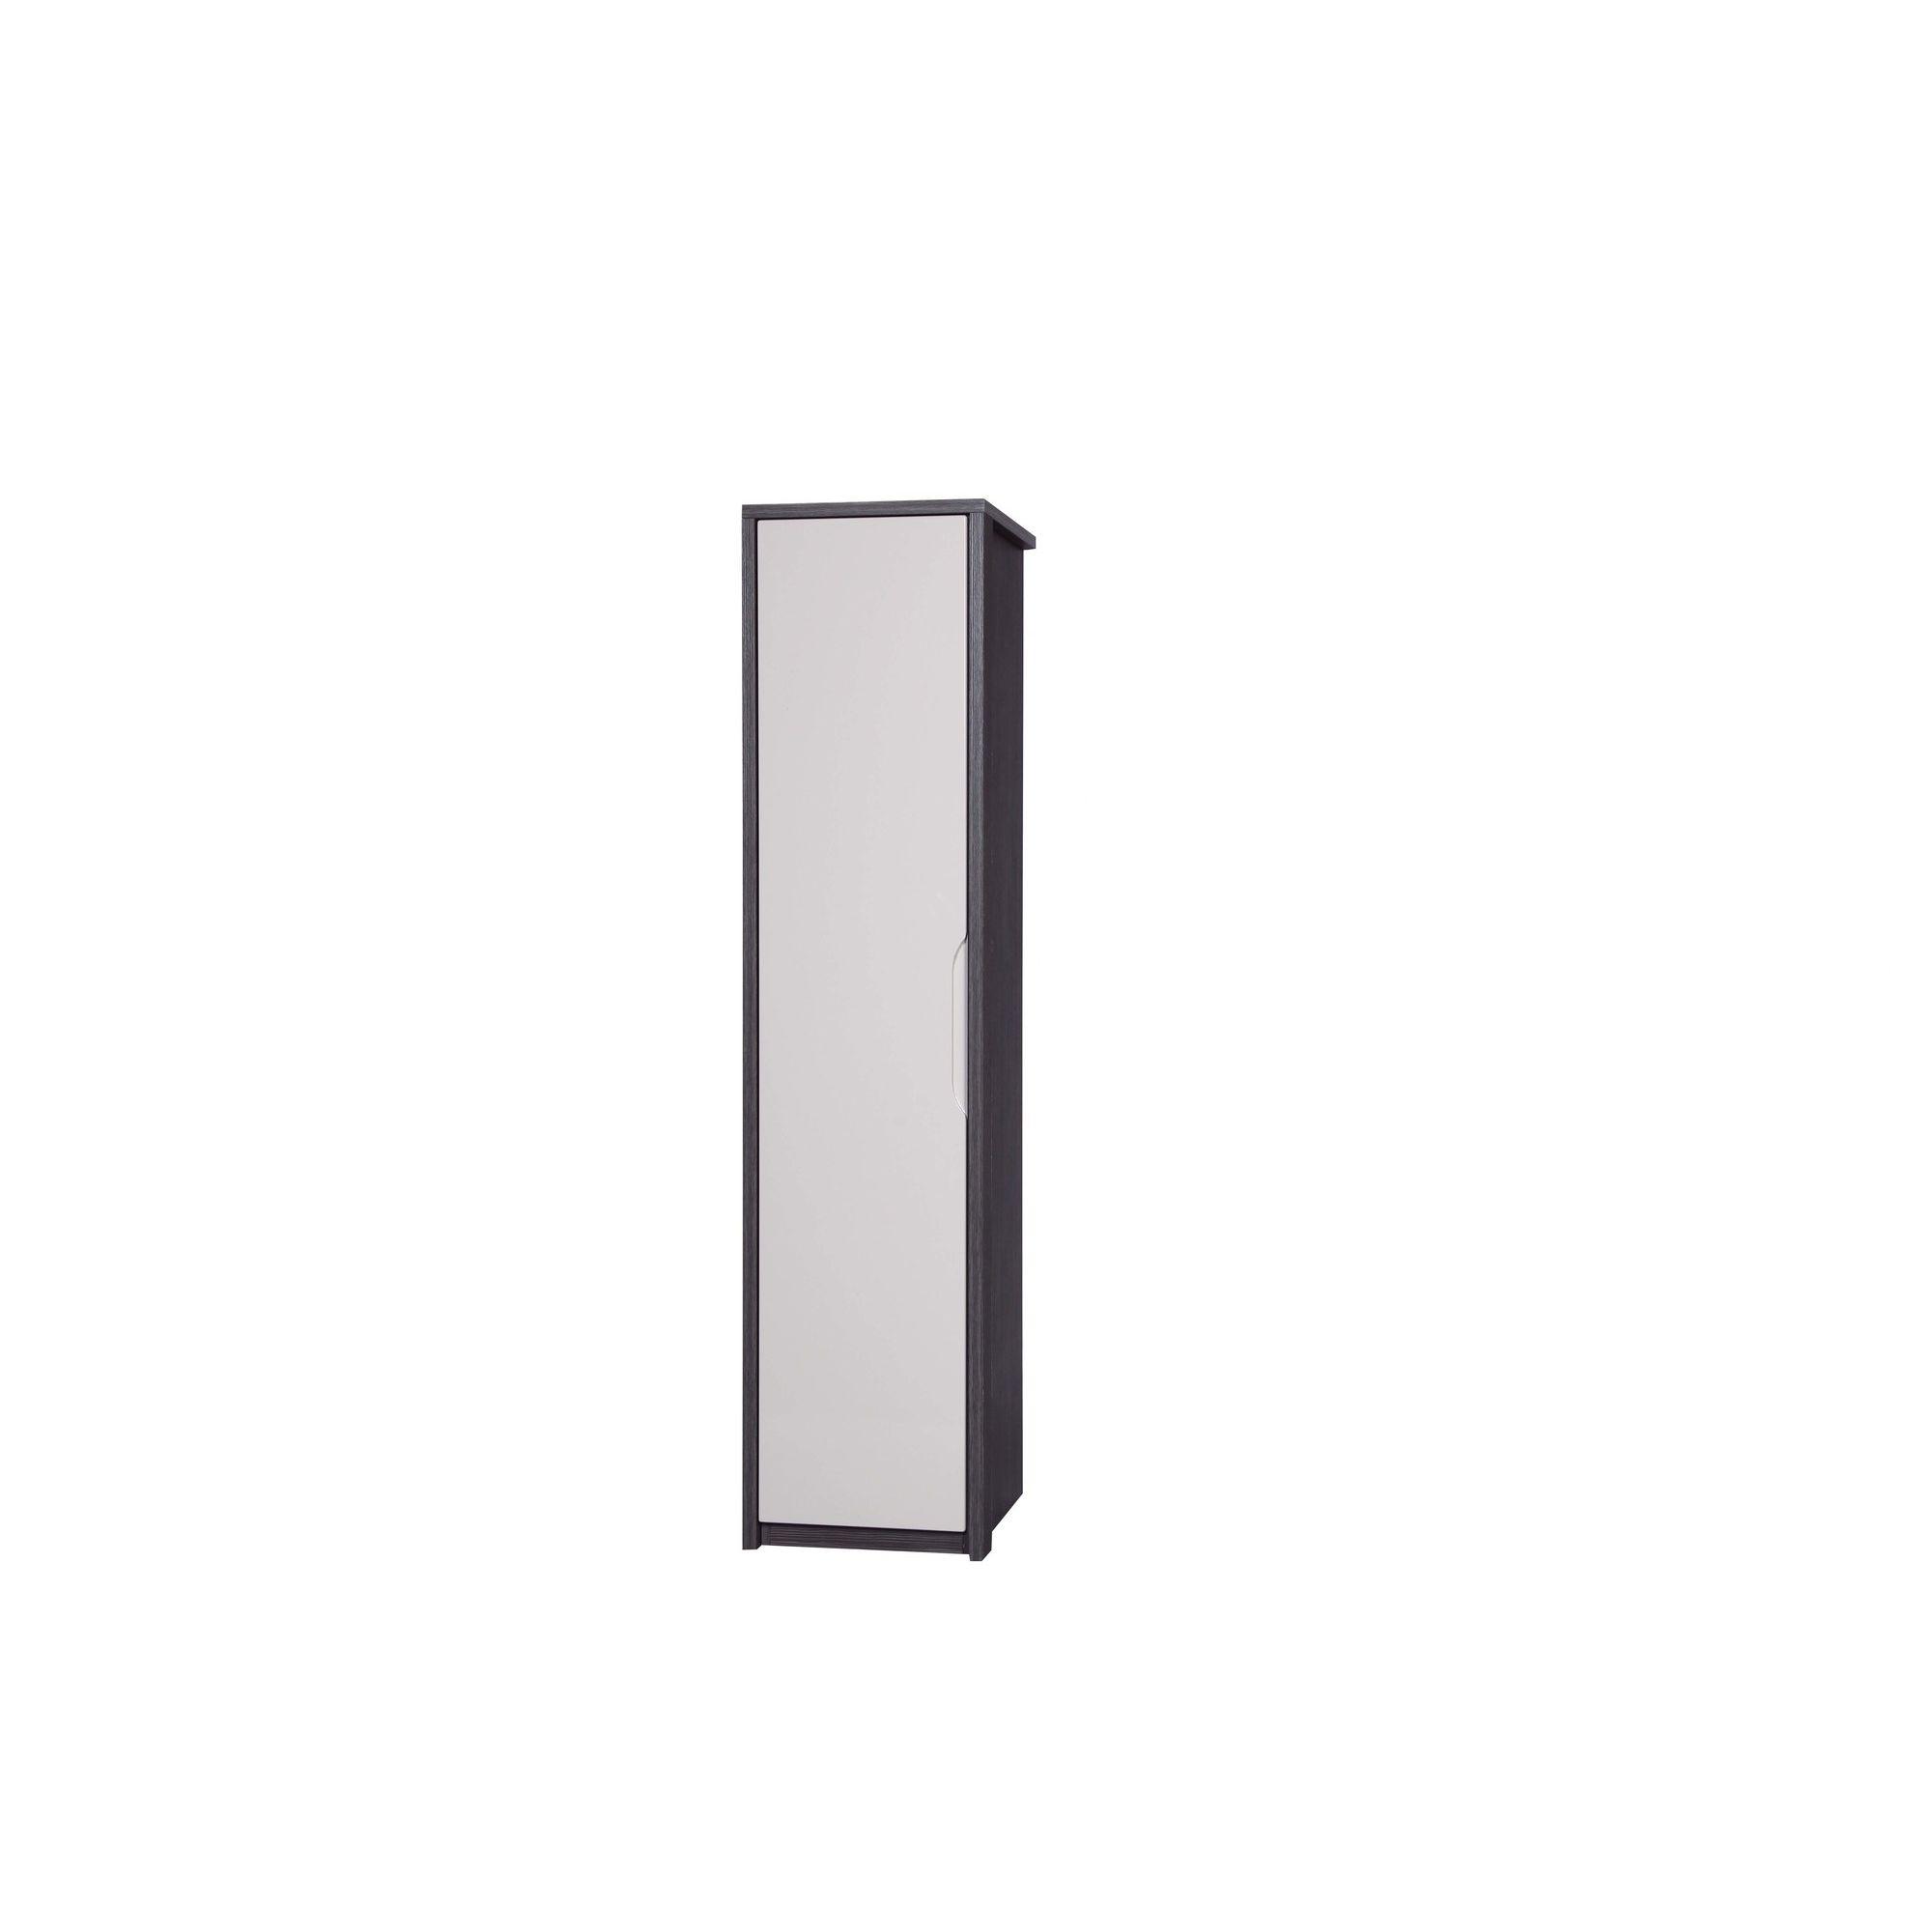 Alto Furniture Avola Single Wardrobe - Grey Avola With Sand Gloss at Tesco Direct